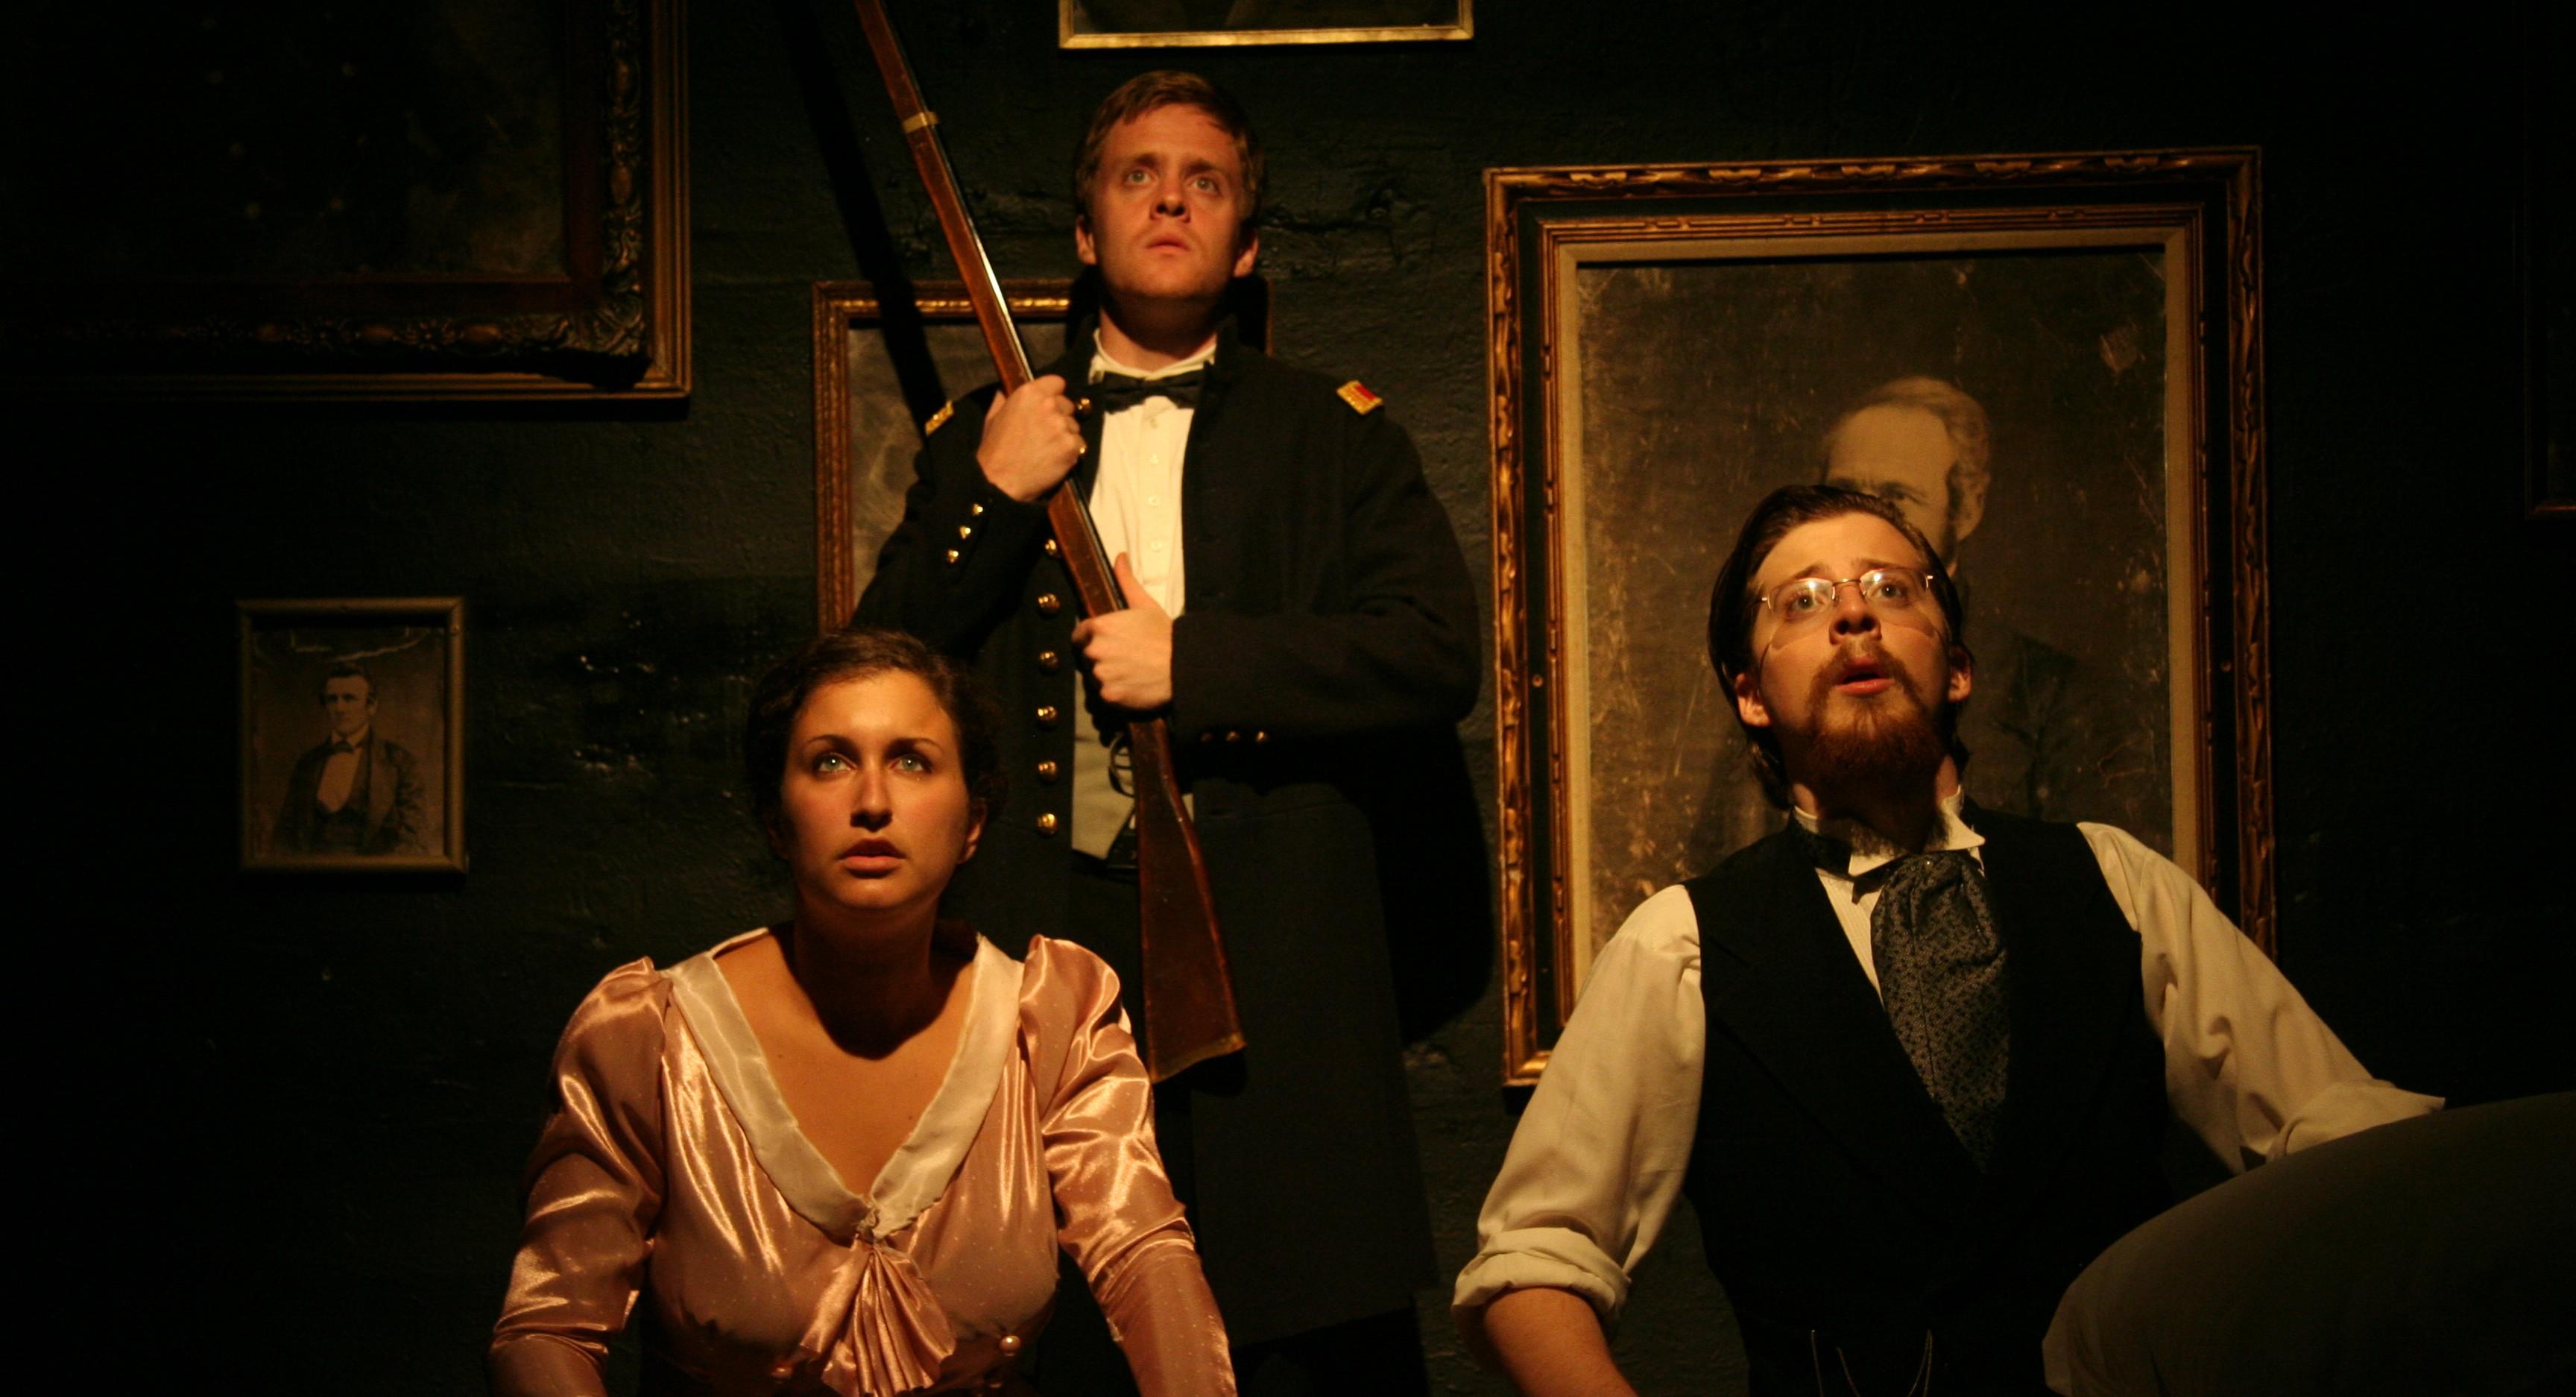 Stephen Brunt Video Essay On Actors - image 7